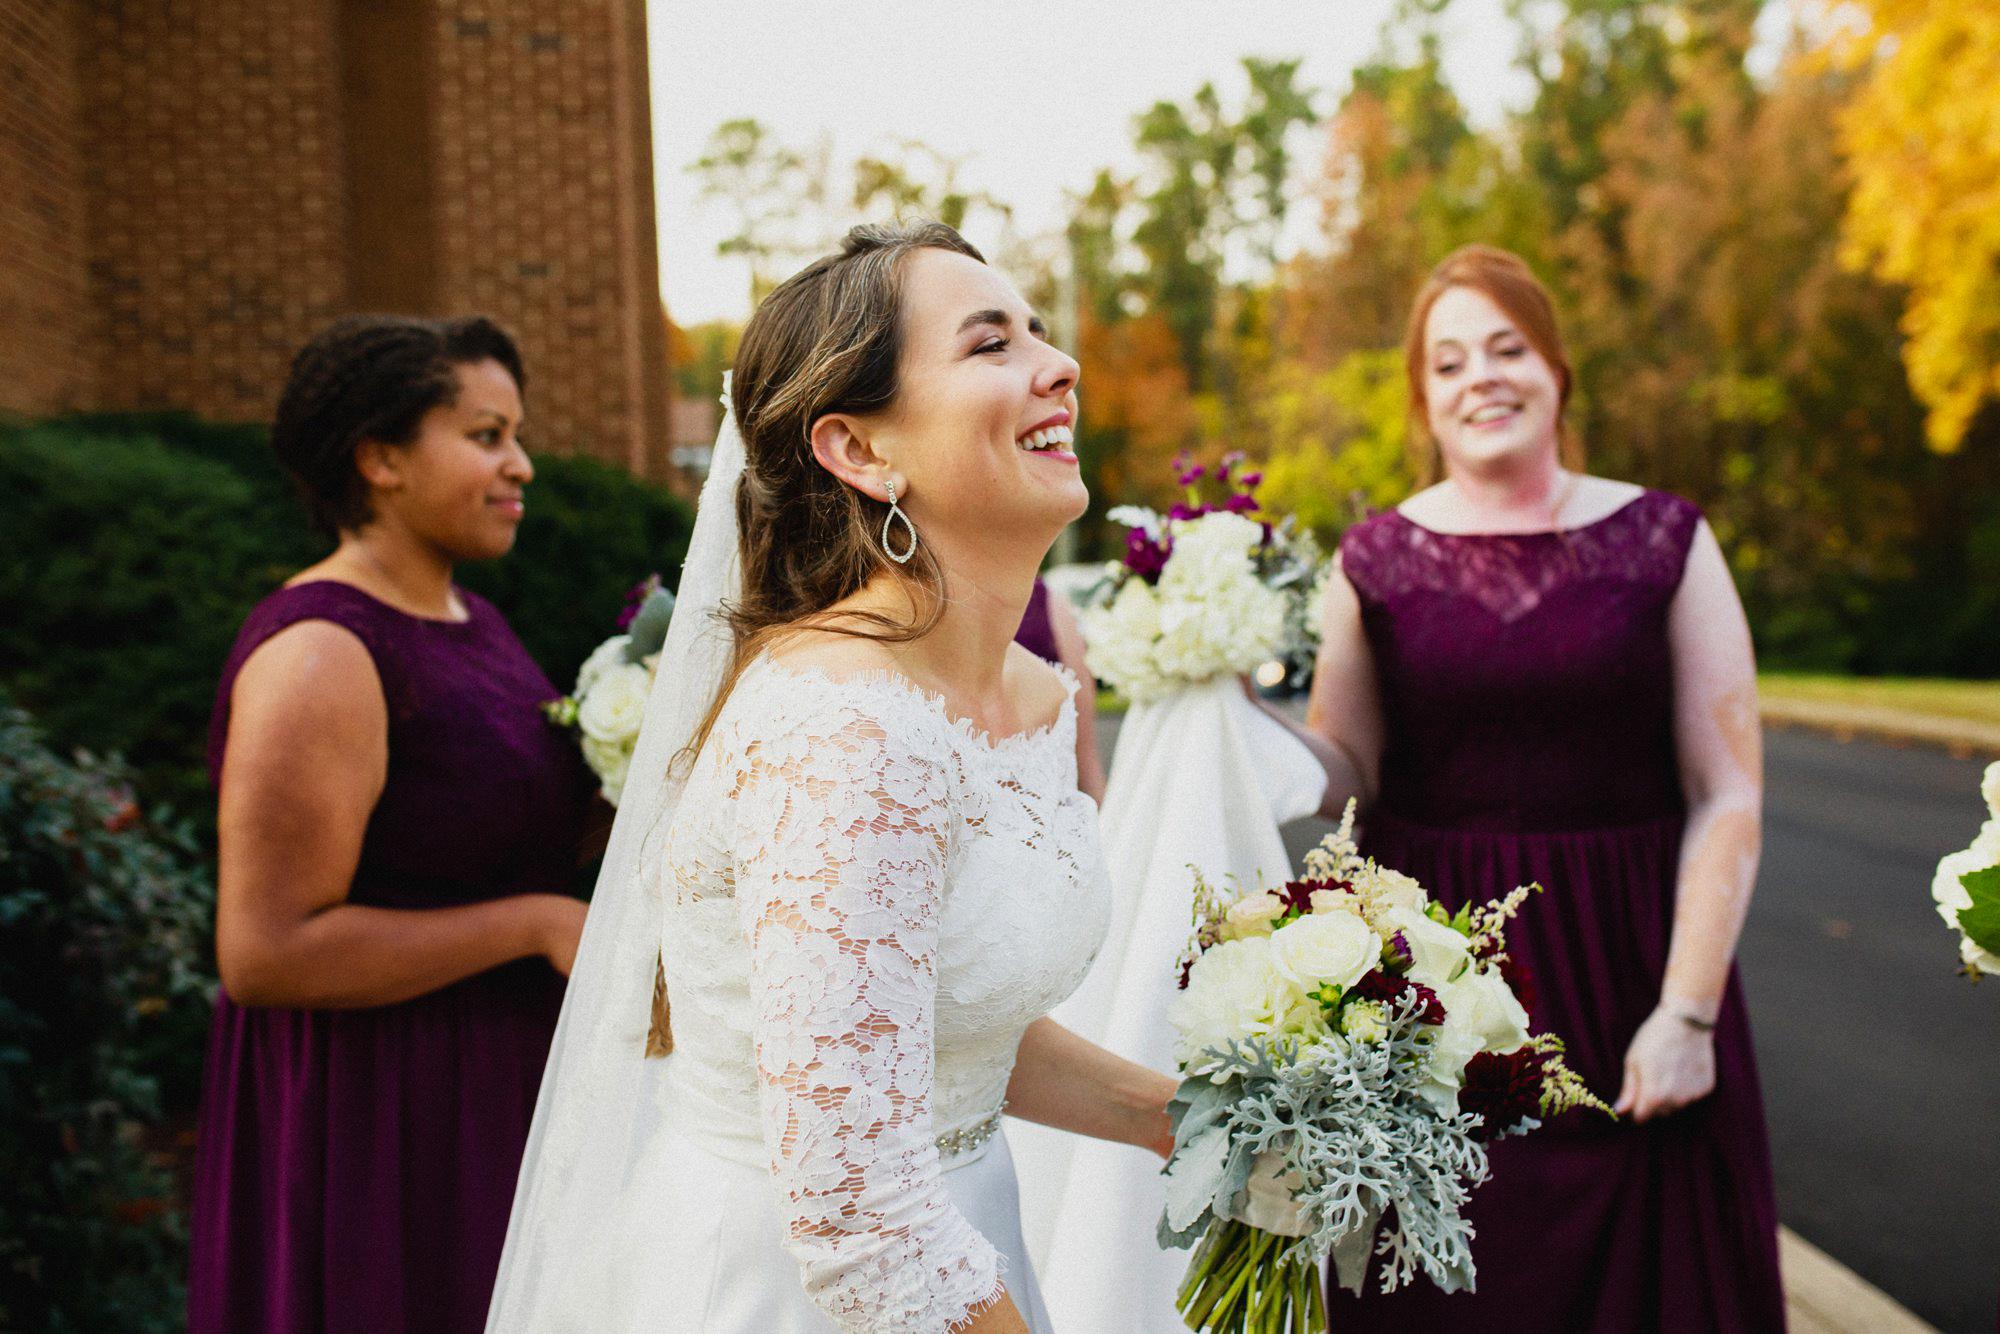 wedding-photography-virginia_0022.jpg